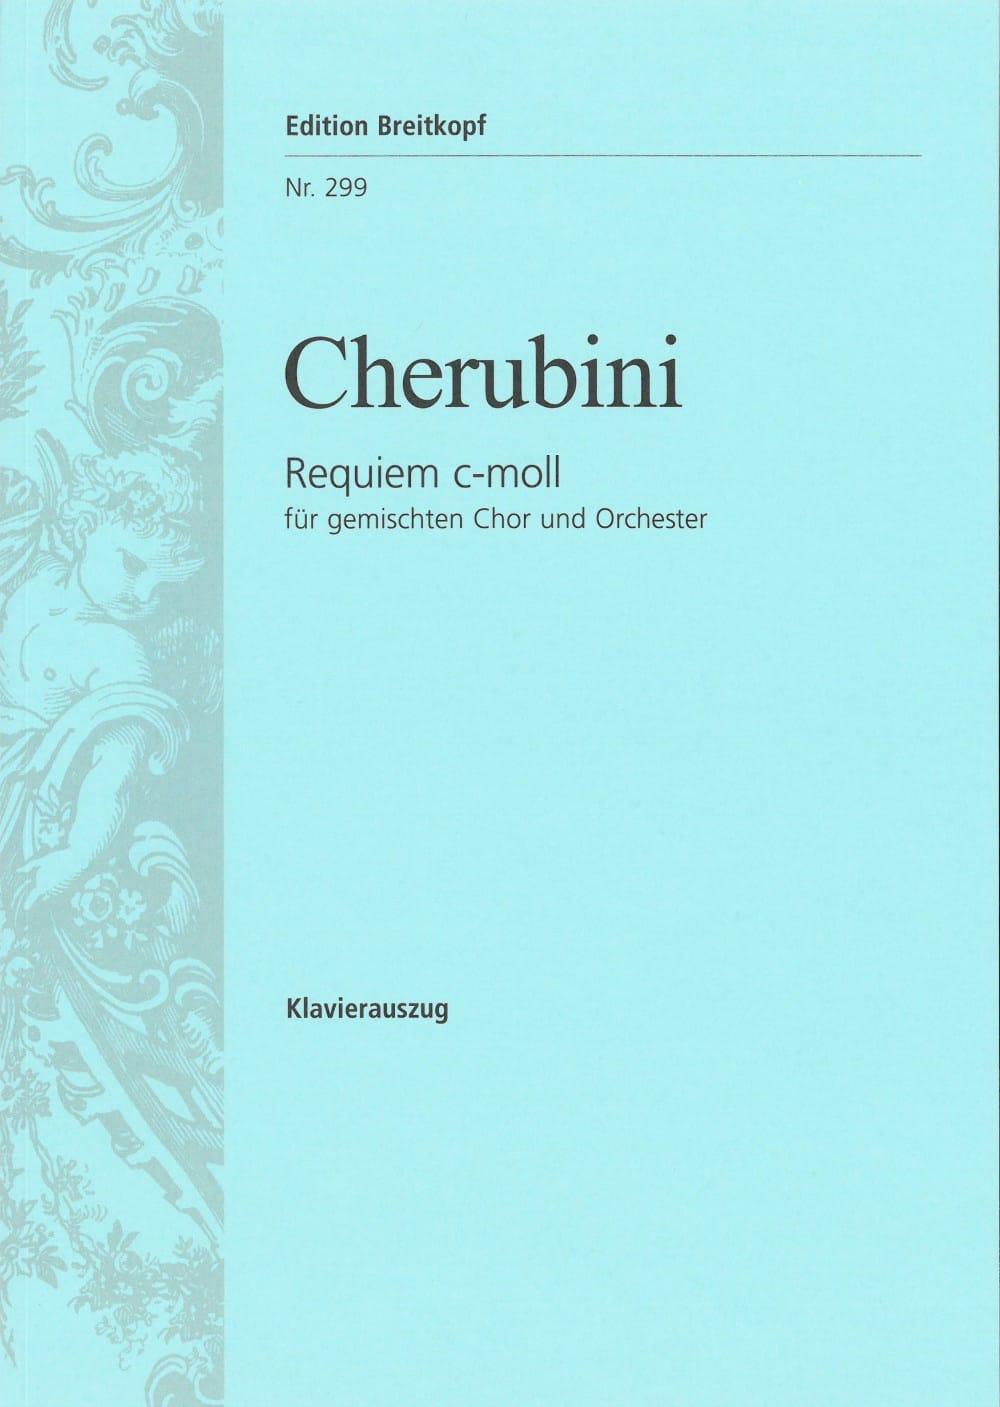 Requiem En Ut Mineur - CHERUBINI - Partition - laflutedepan.com